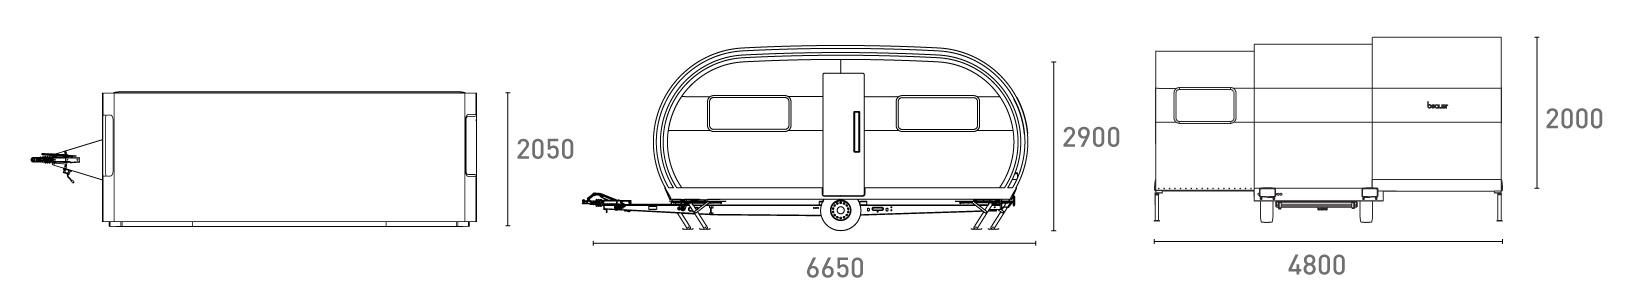 3XPlus layout drawing.jpg